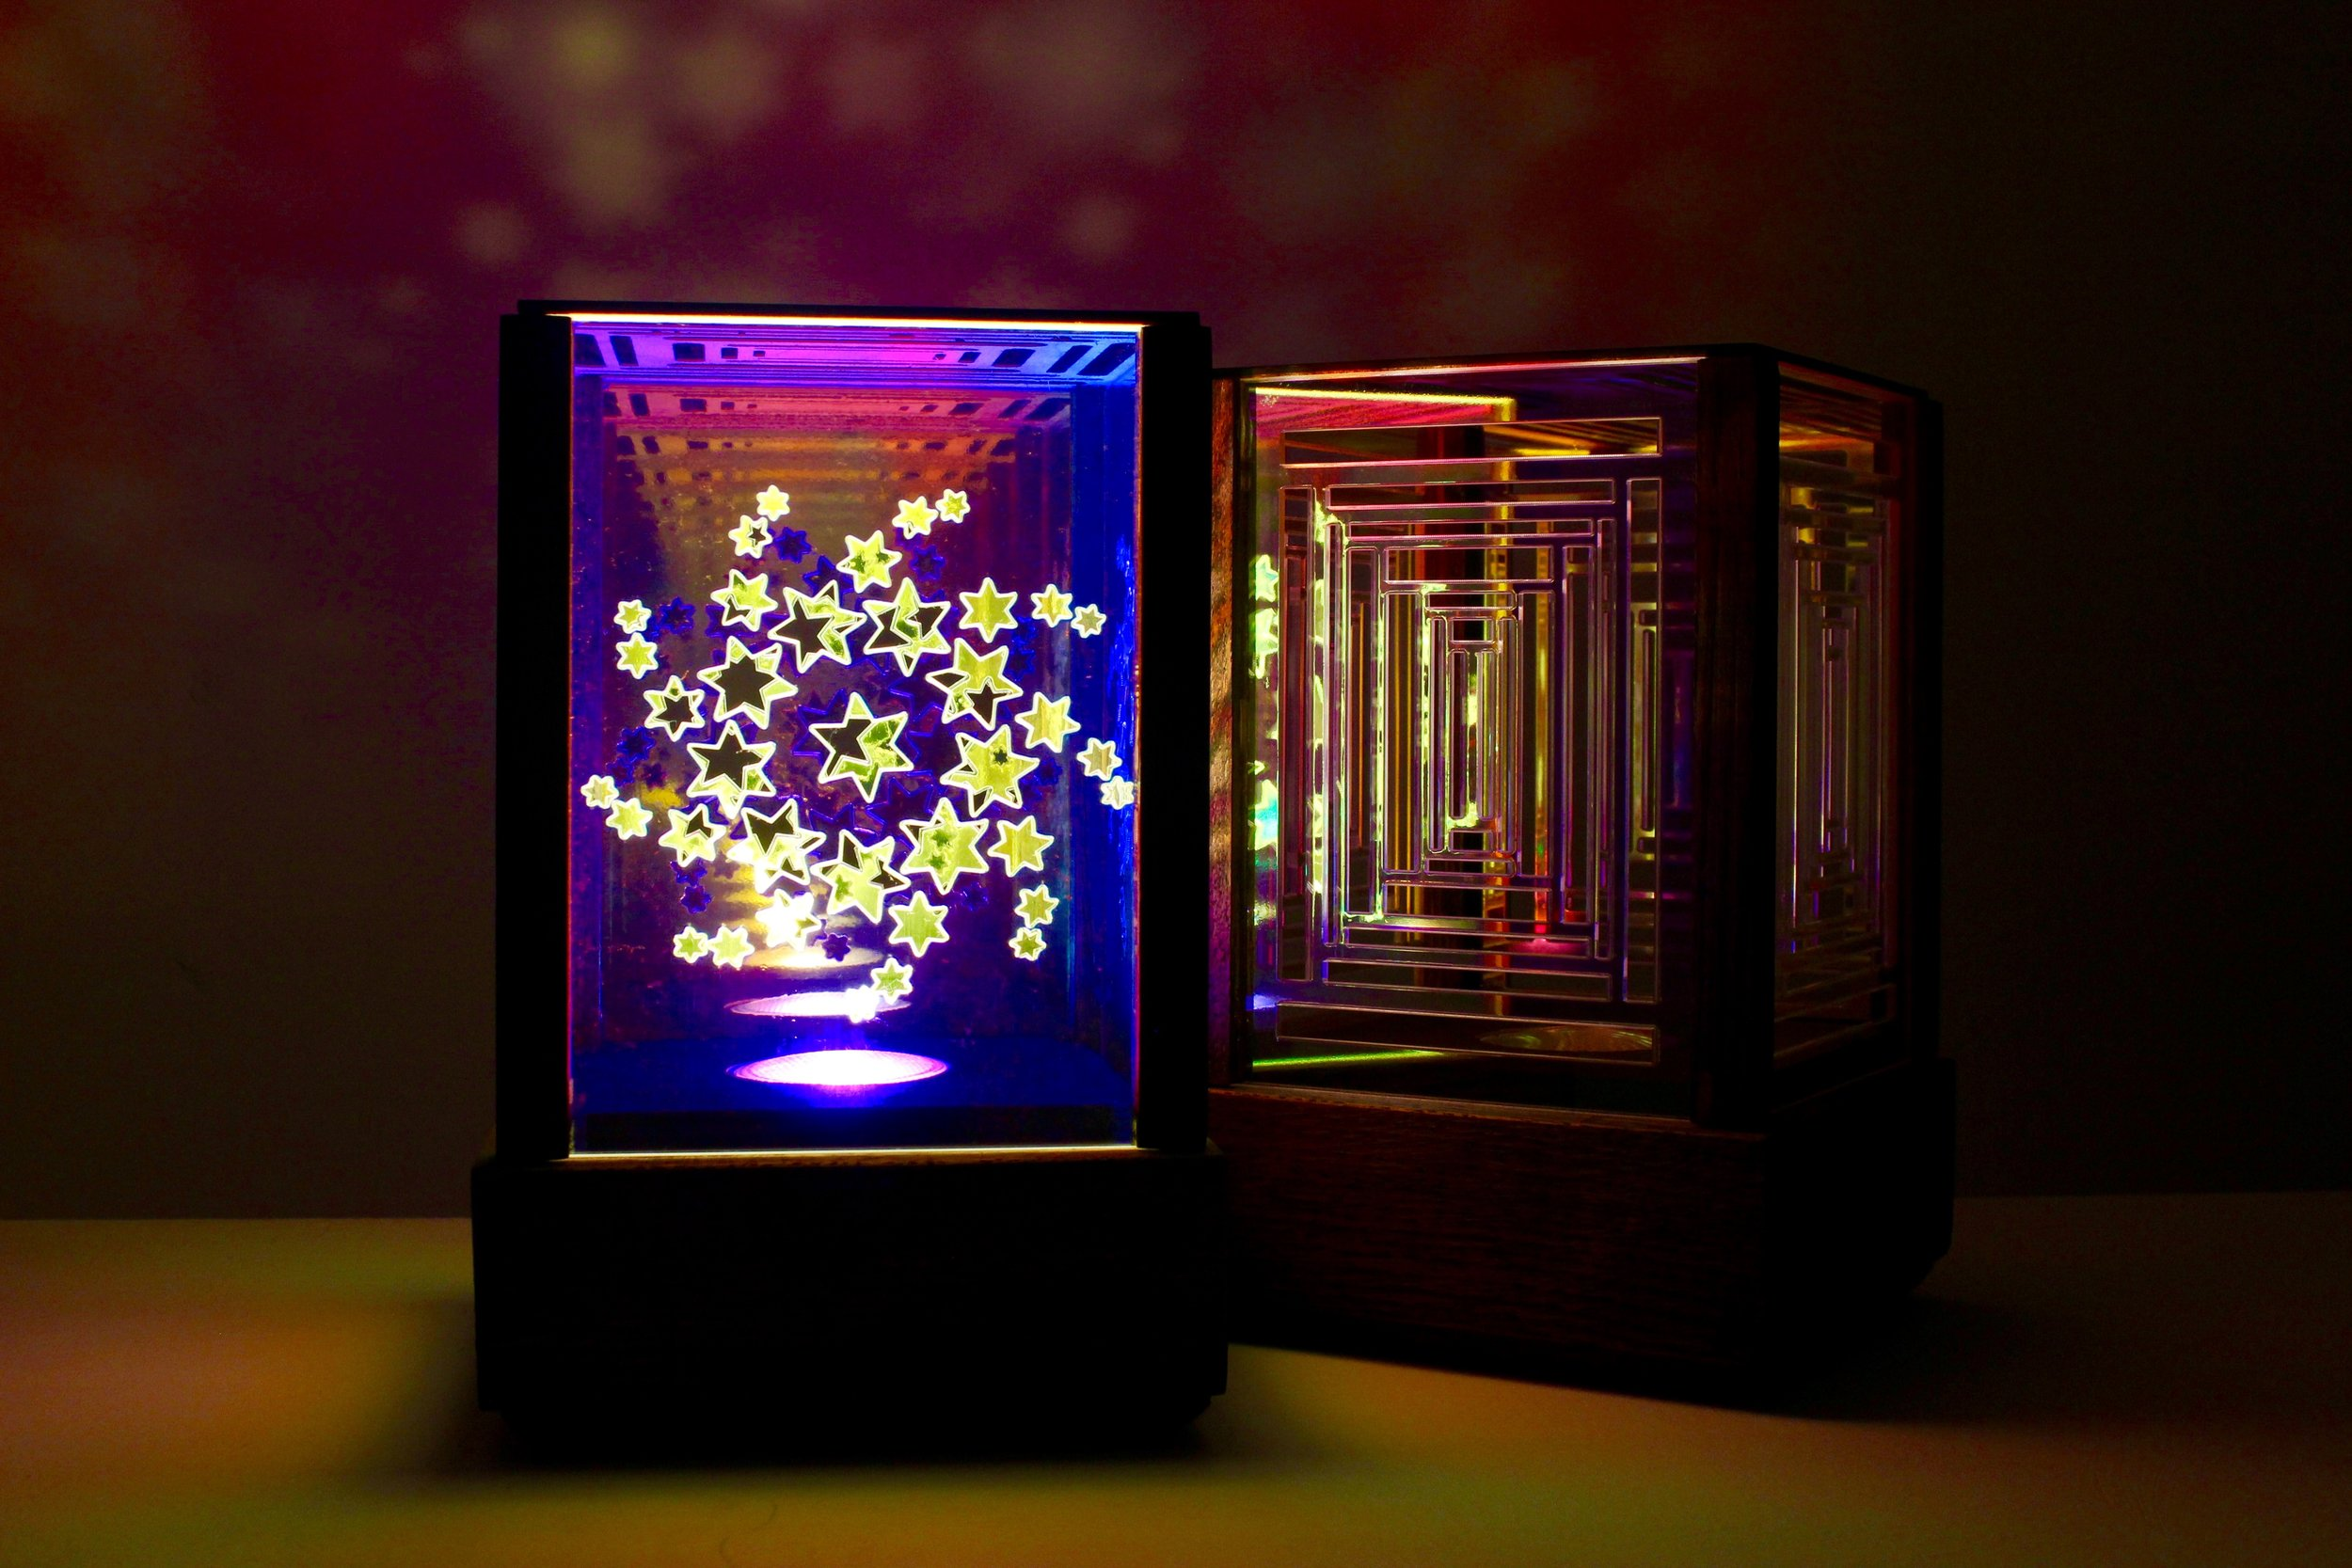 Star Gazer Iridescent Lamp